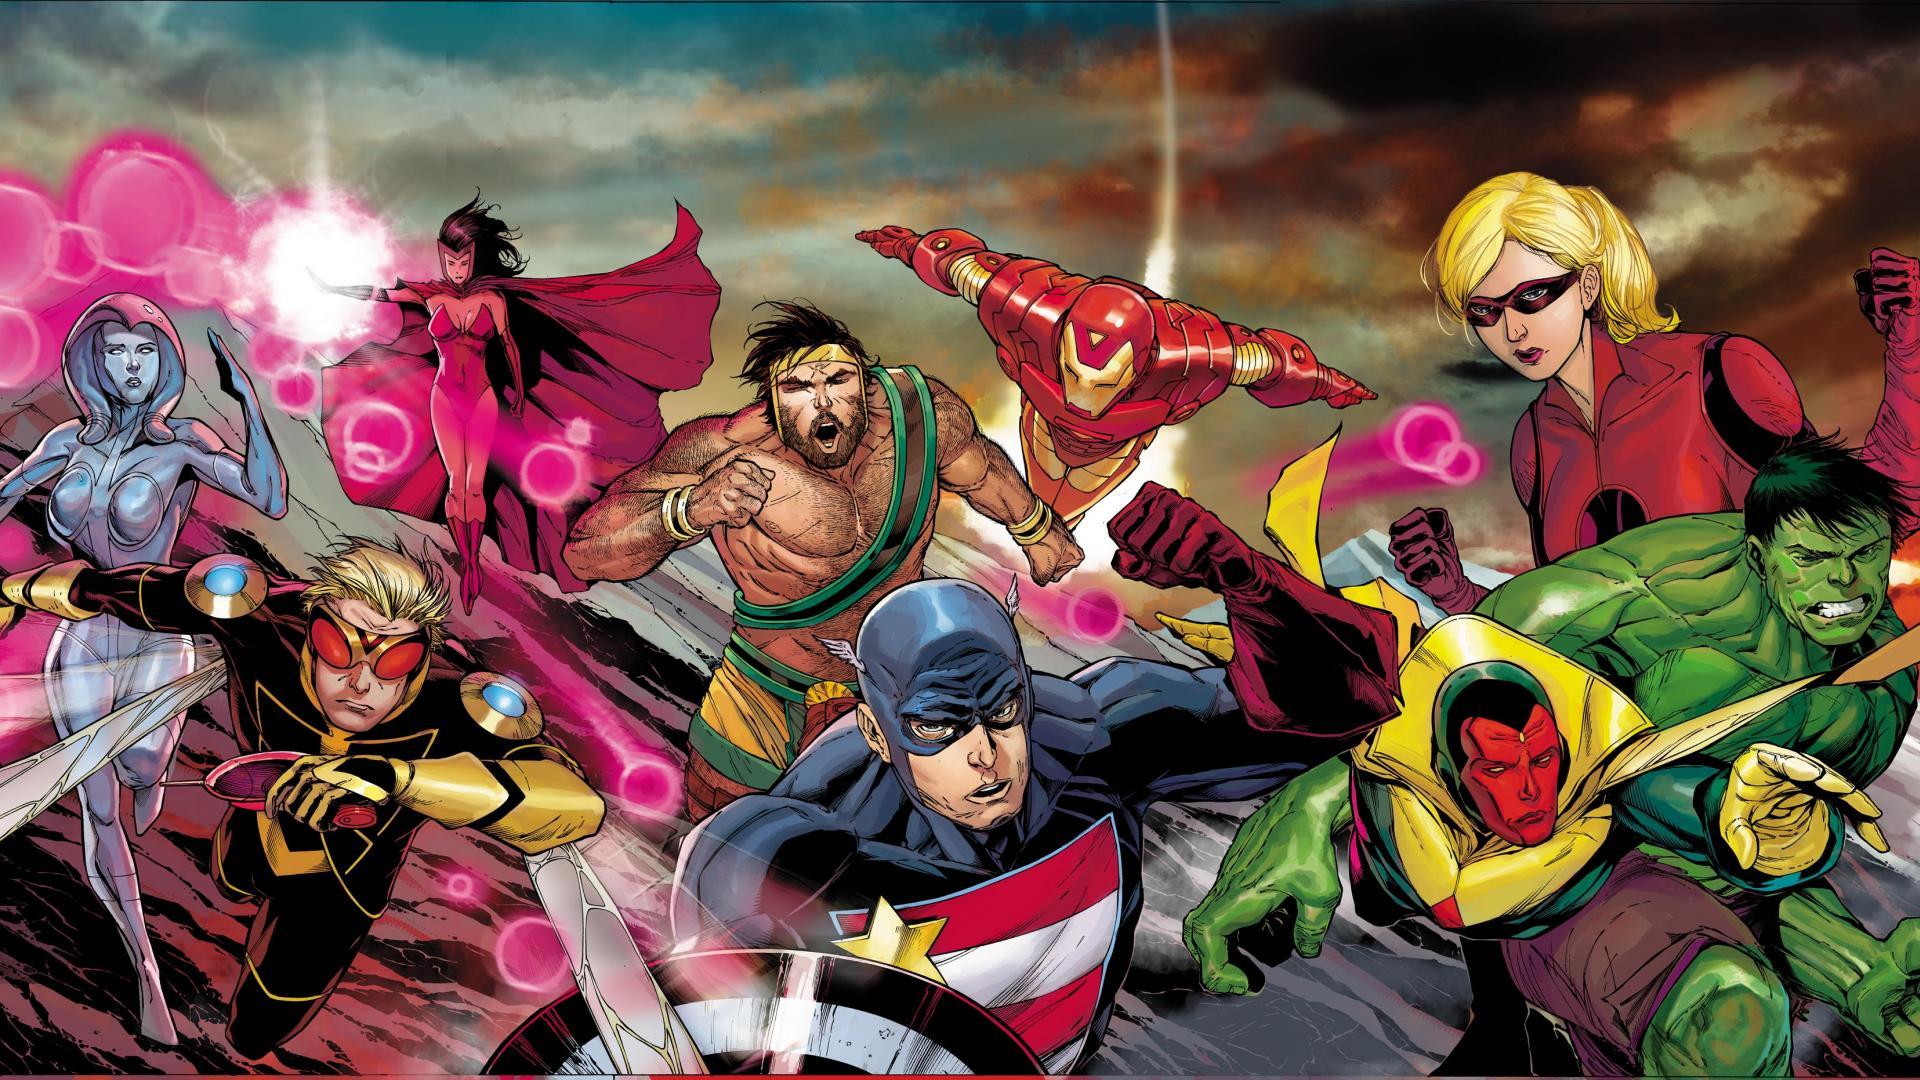 comics hercules hulk comic character iron man marvel comics wallpaper 1920x1080